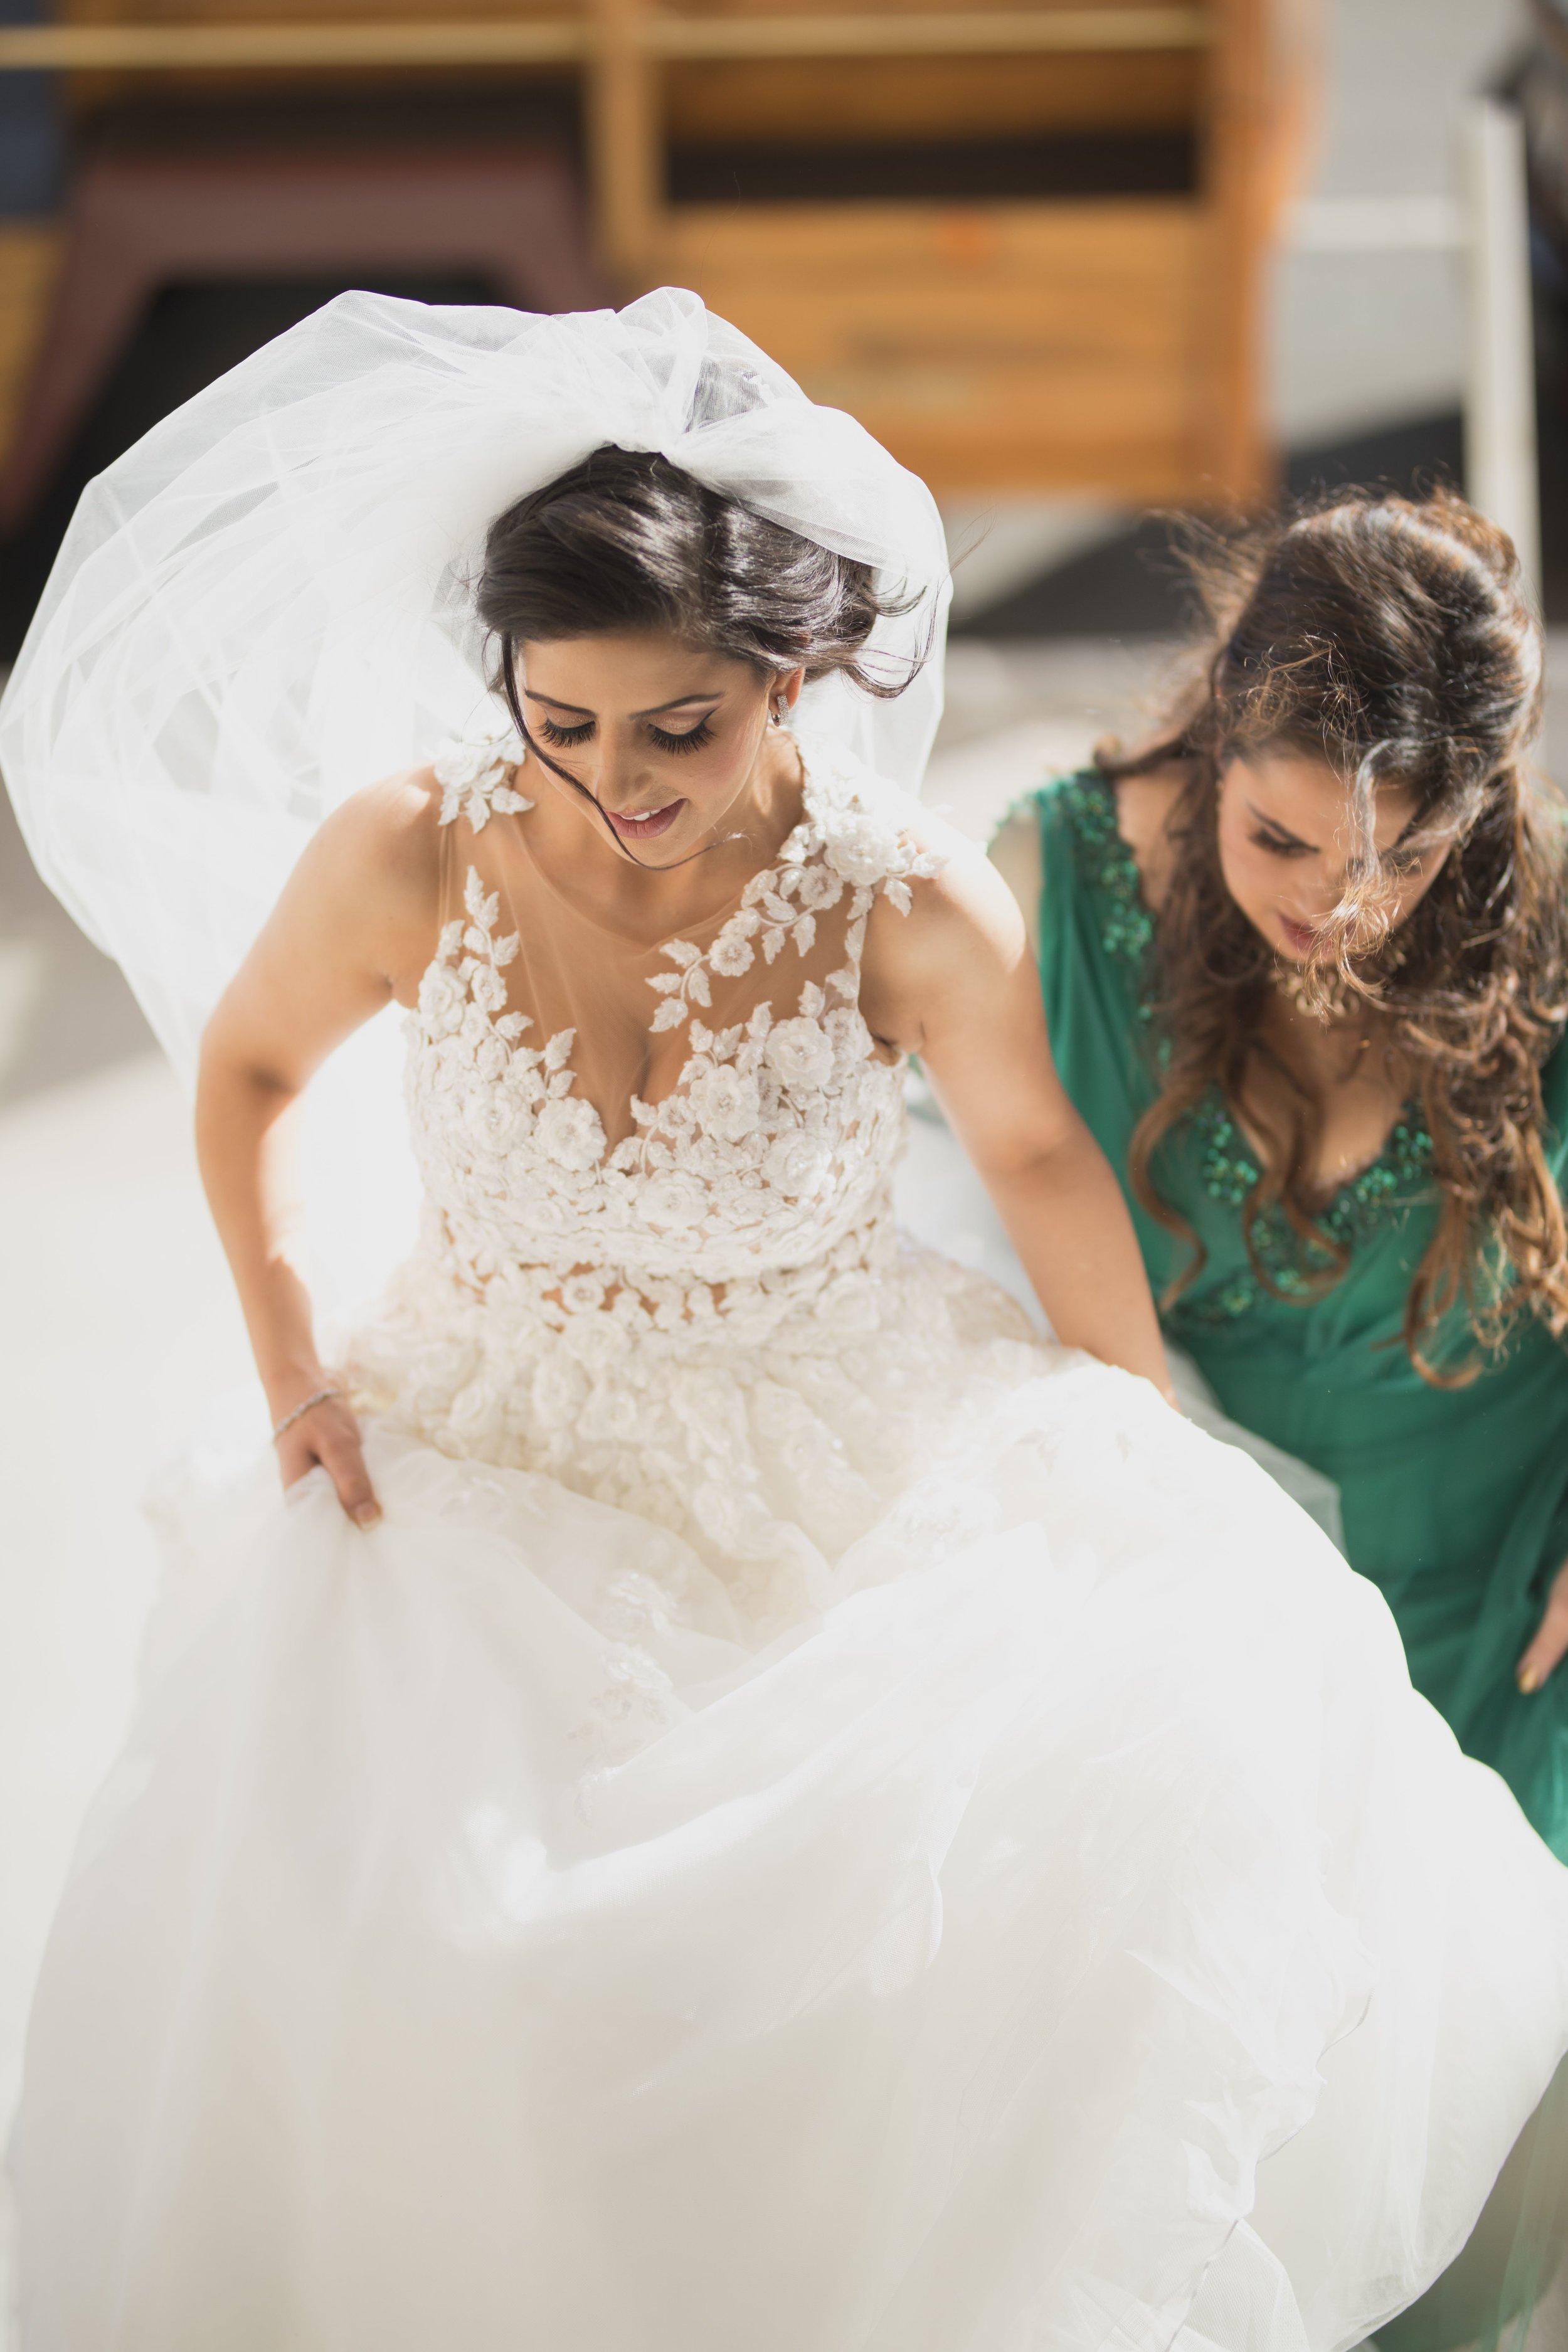 Pre-Wedding14.jpg